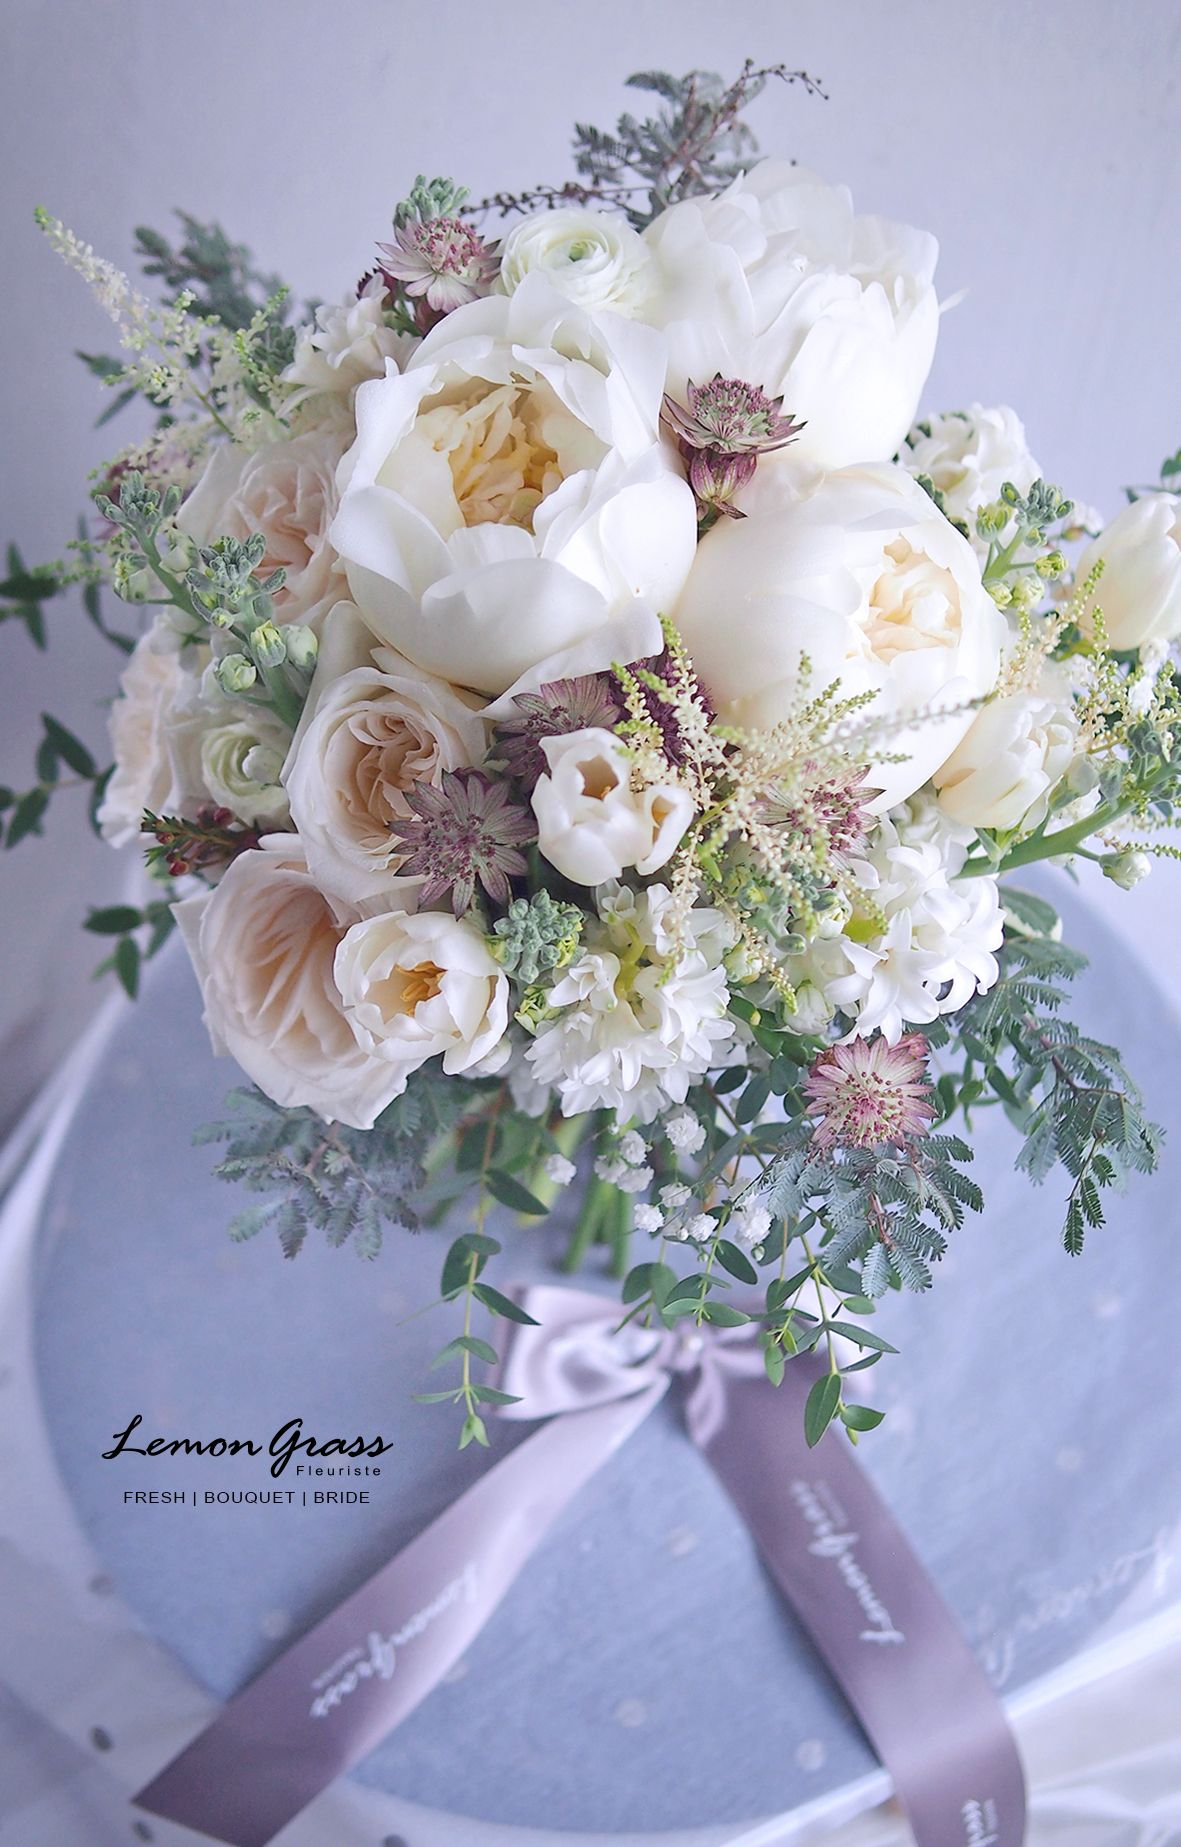 Pin by lemongrasswedding on fresh flower bouquets pinterest floral bouquets bride bouquets hand bouquet flower arrangement floral arrangements bridal style fresh flowers boutonnieres wedding flowers izmirmasajfo